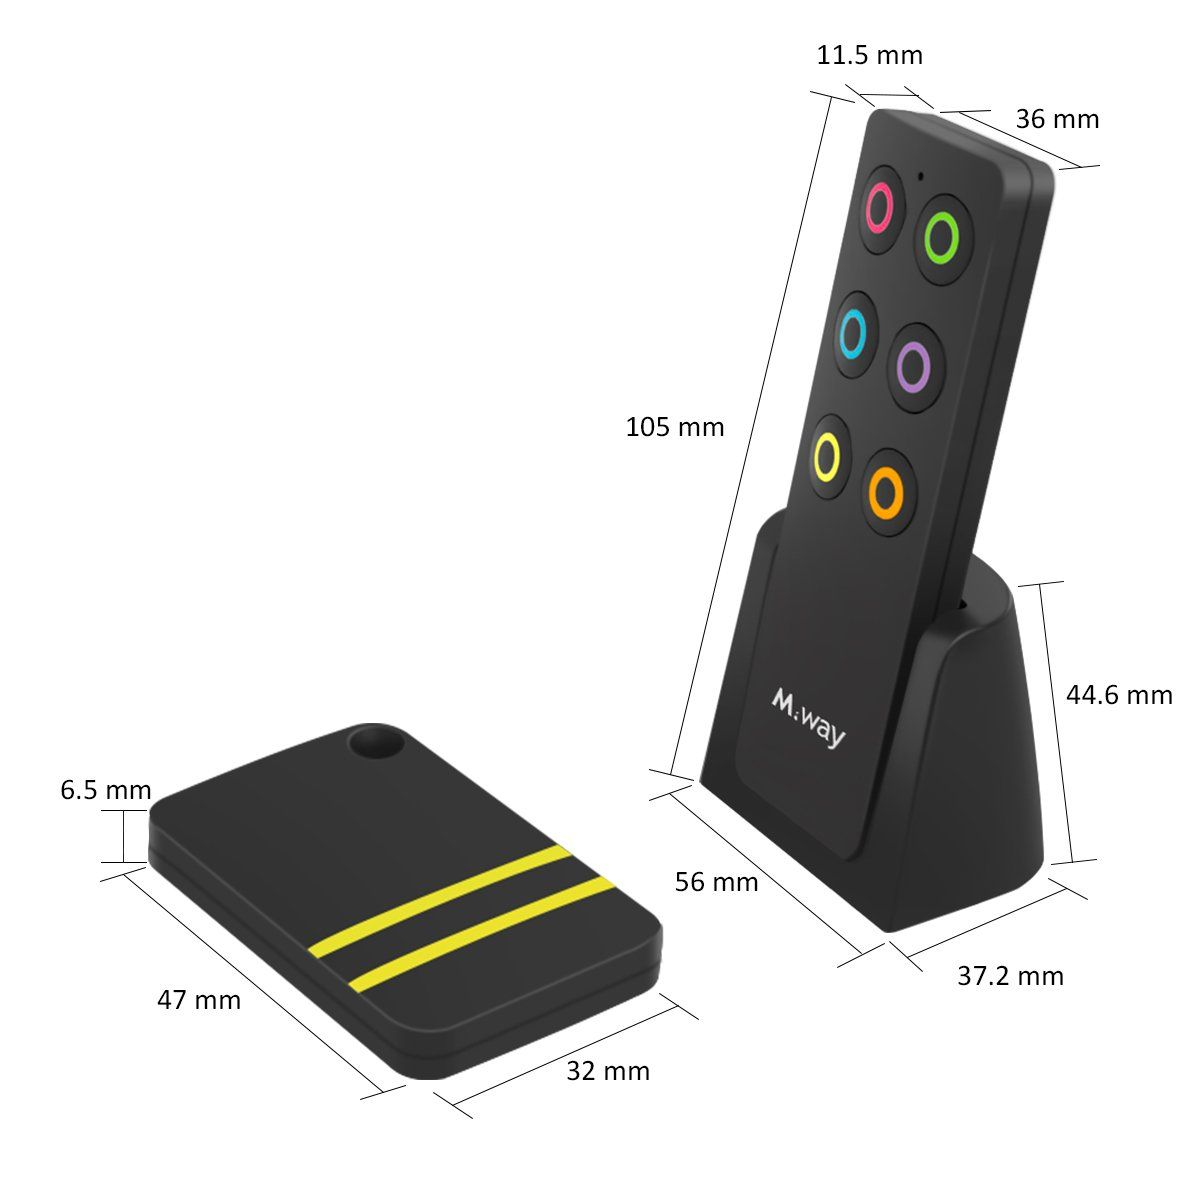 fafffe15b74a Key Finder MWAY Wireless RF Item Locator Key Tracker Antilost Alarm Keychain  1 RF Transmitter and